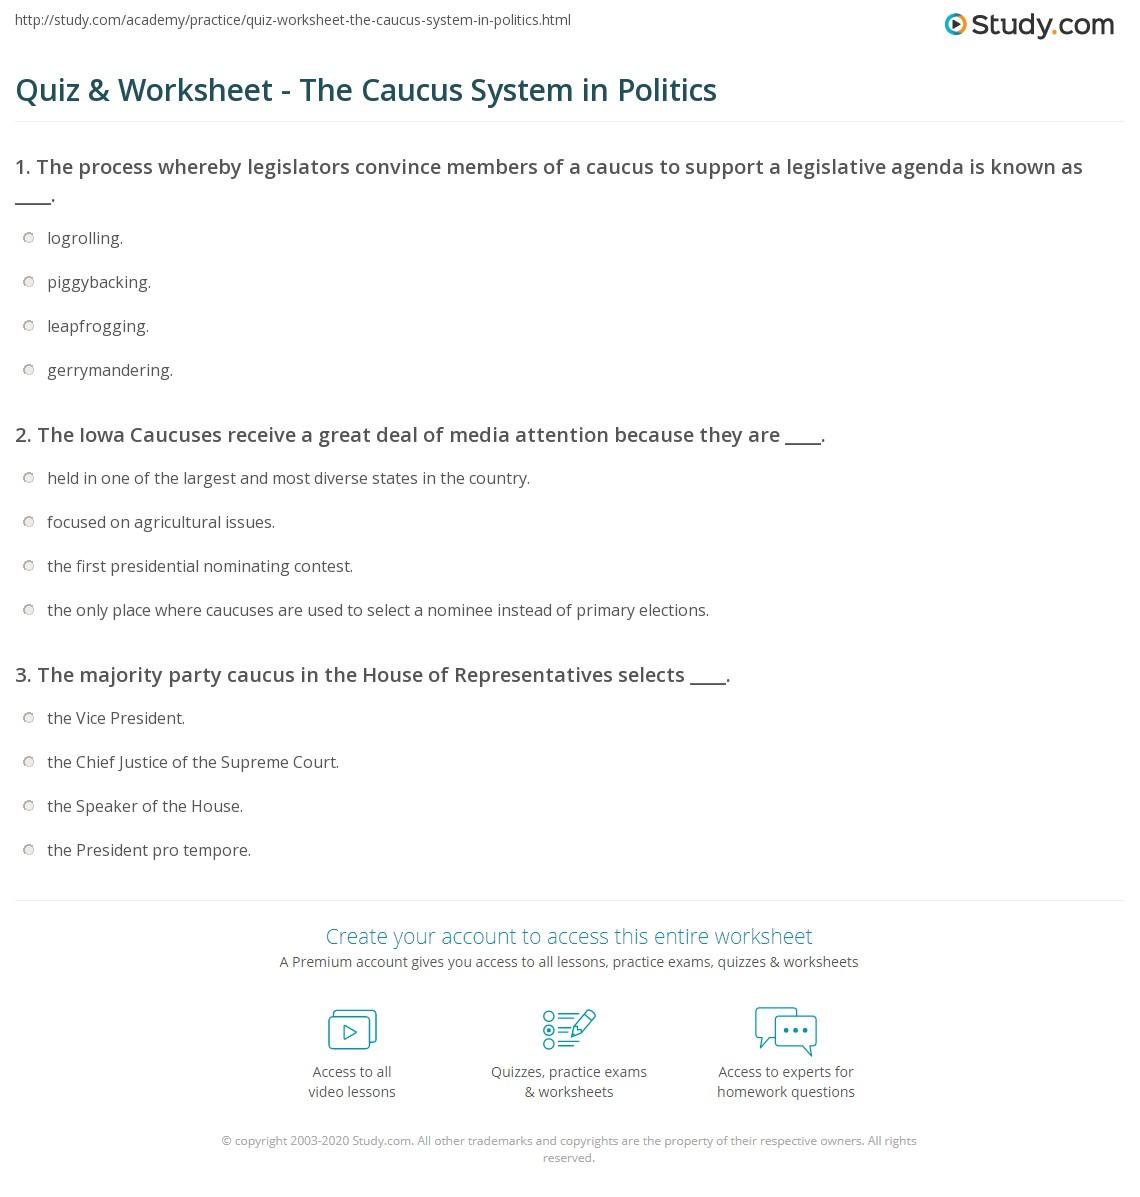 quiz & worksheet - the caucus system in politics | study